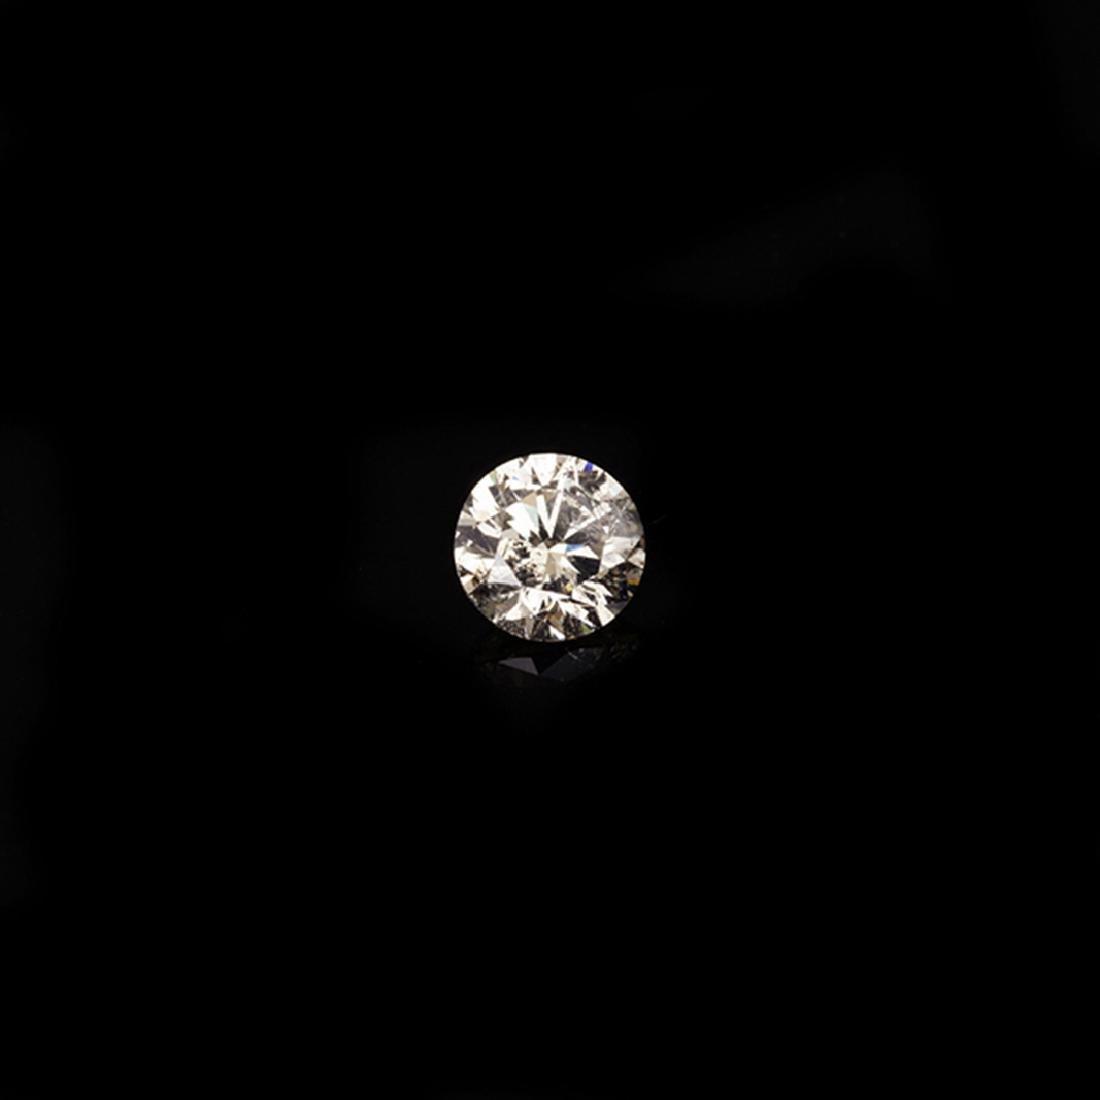 Fine Jewelry GIA Certified 0.26CT Brilliant Round Cut